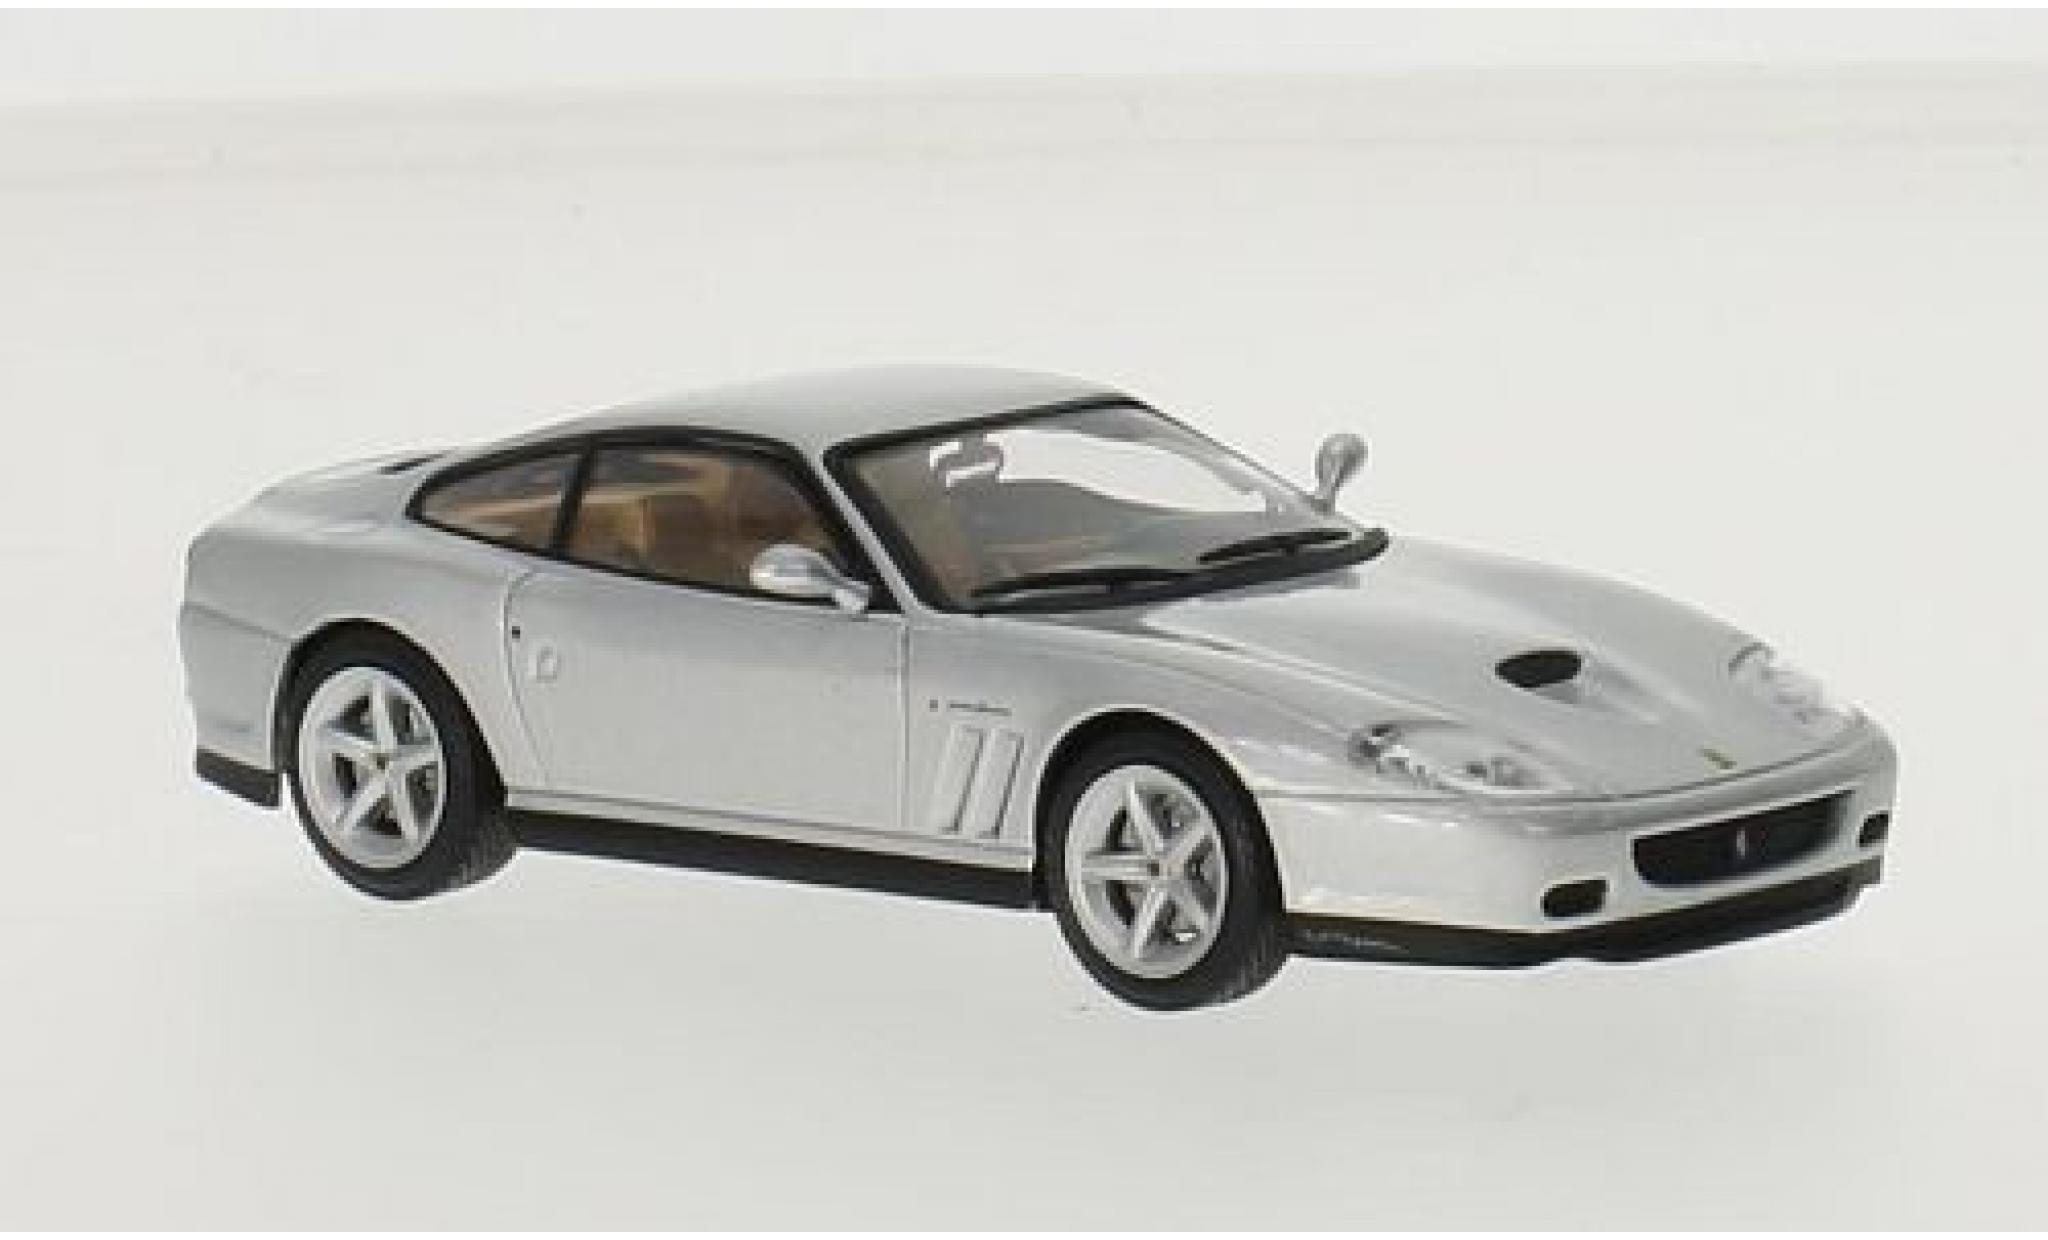 Ferrari 575 1/43 SpecialC 45 M Maranello grise sans Vitrine